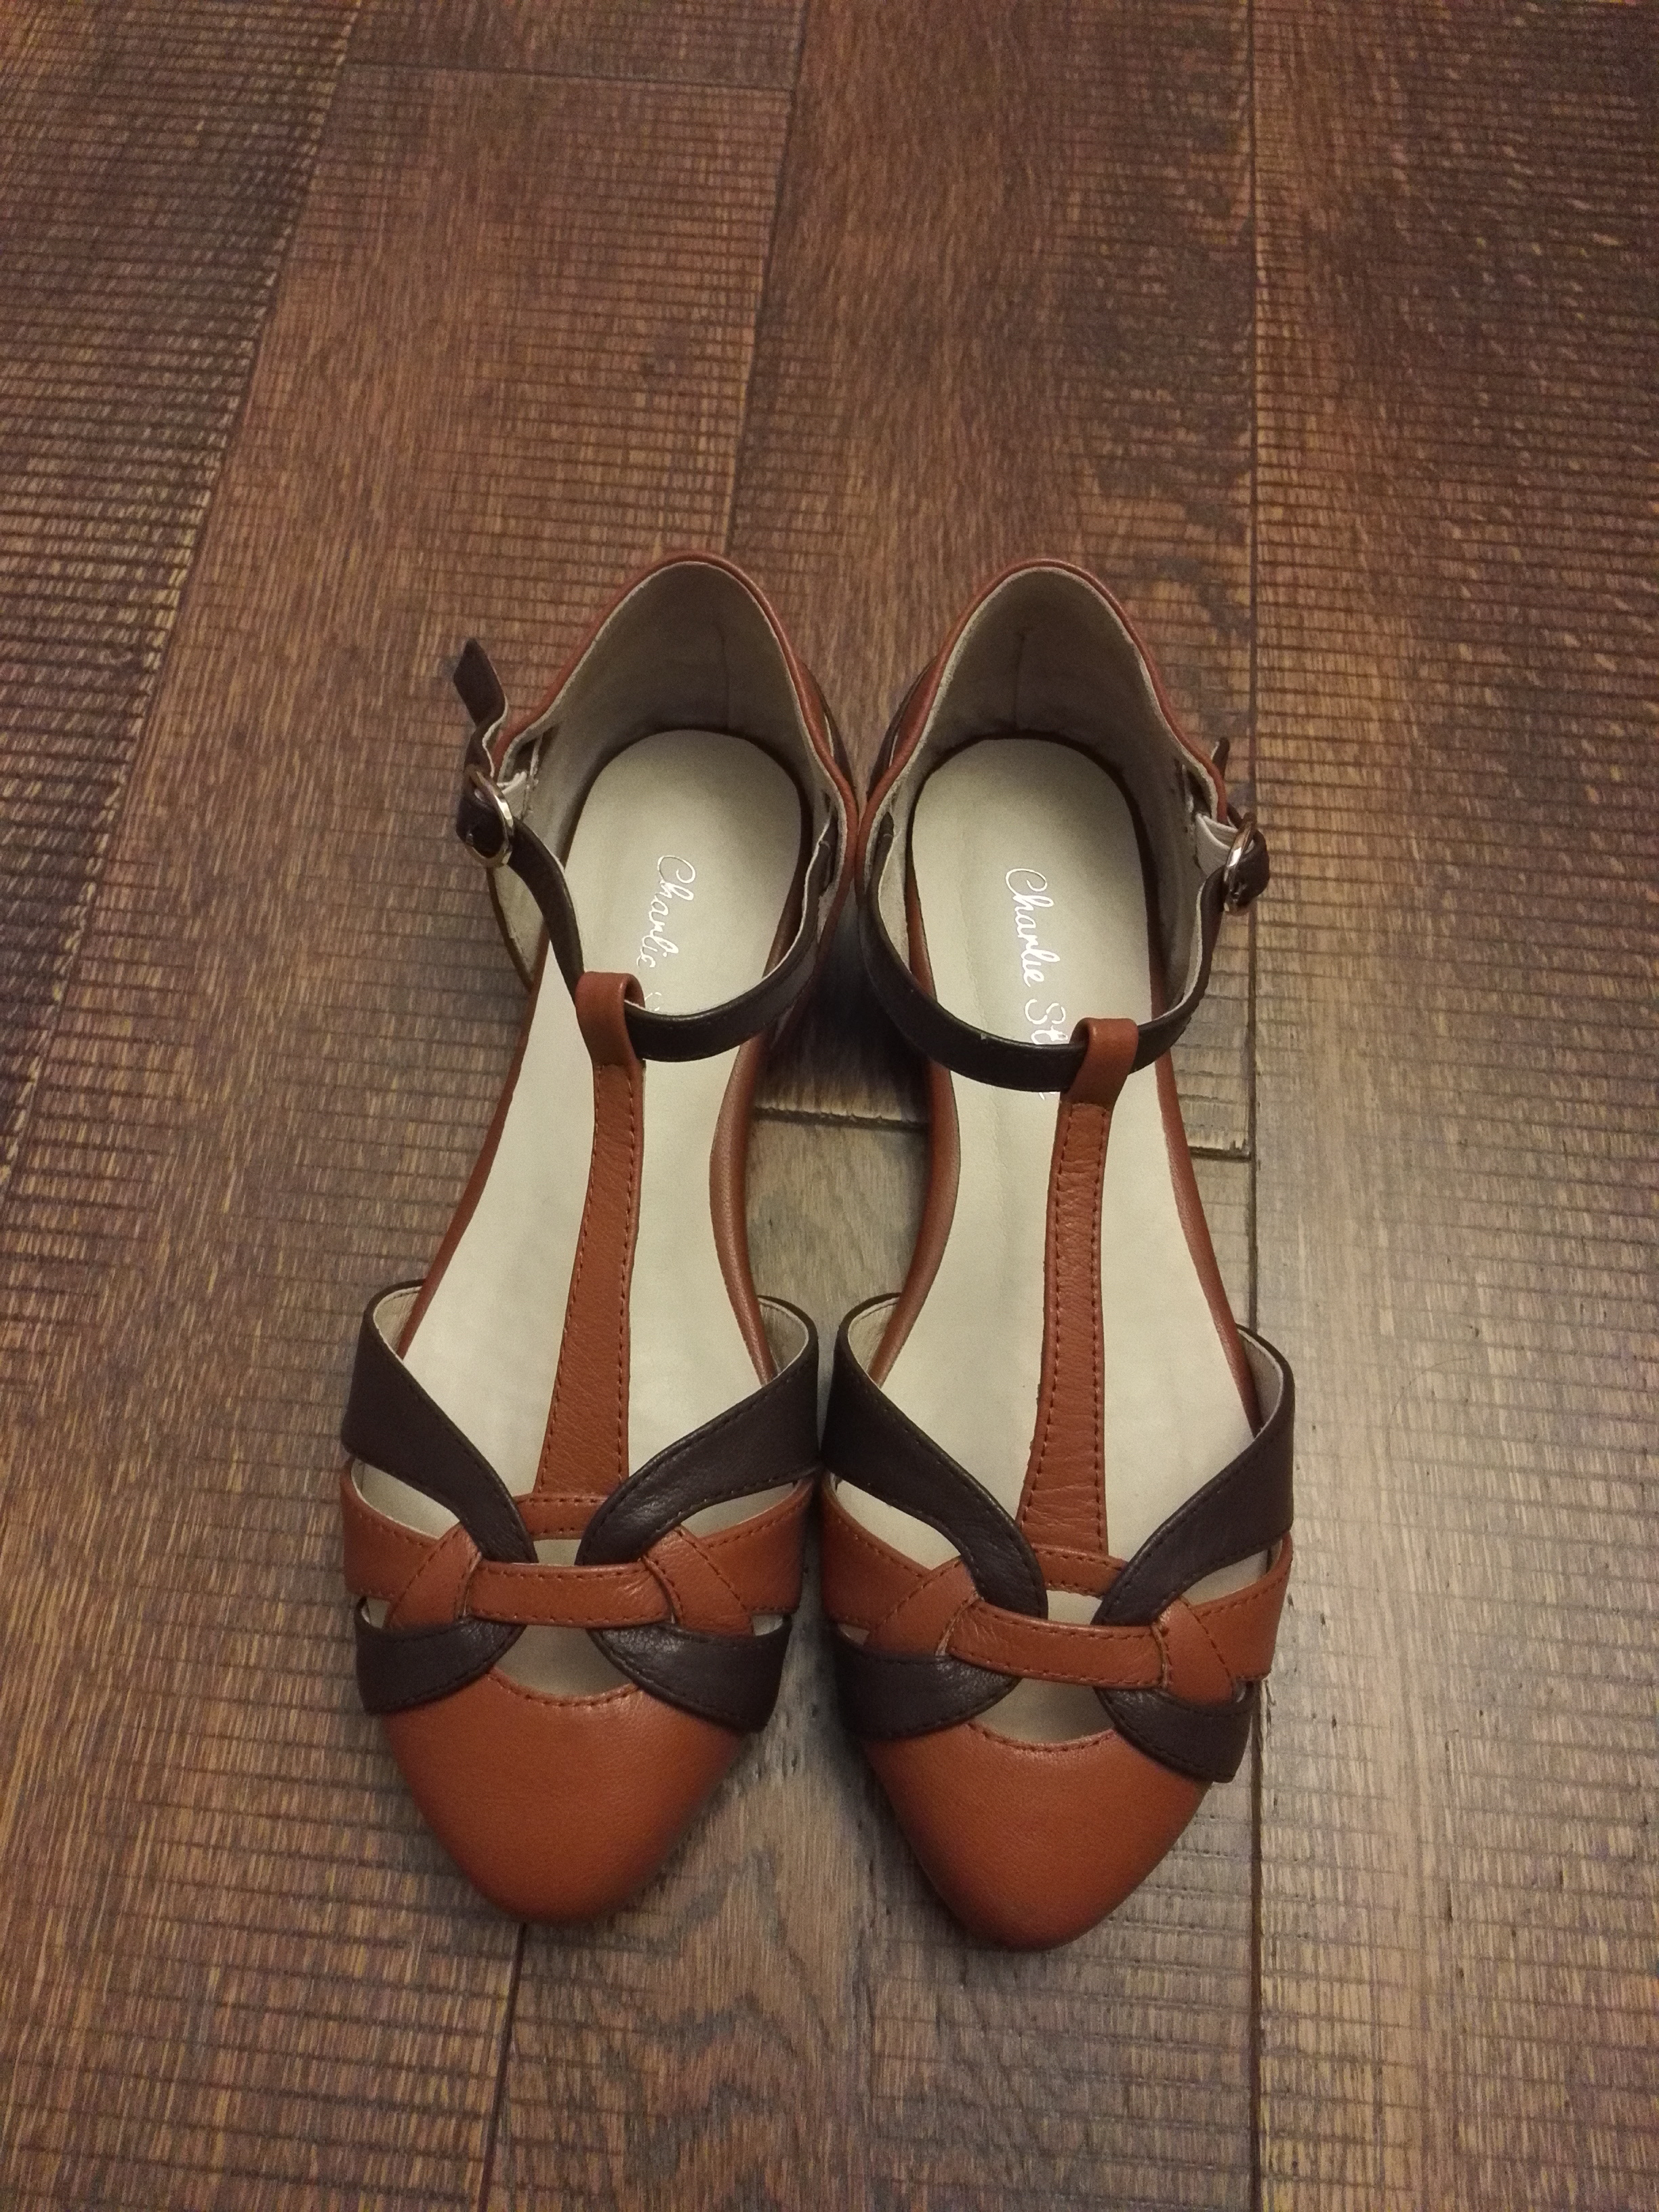 Phyllis 的 Charlie Stone 舞鞋:Peta